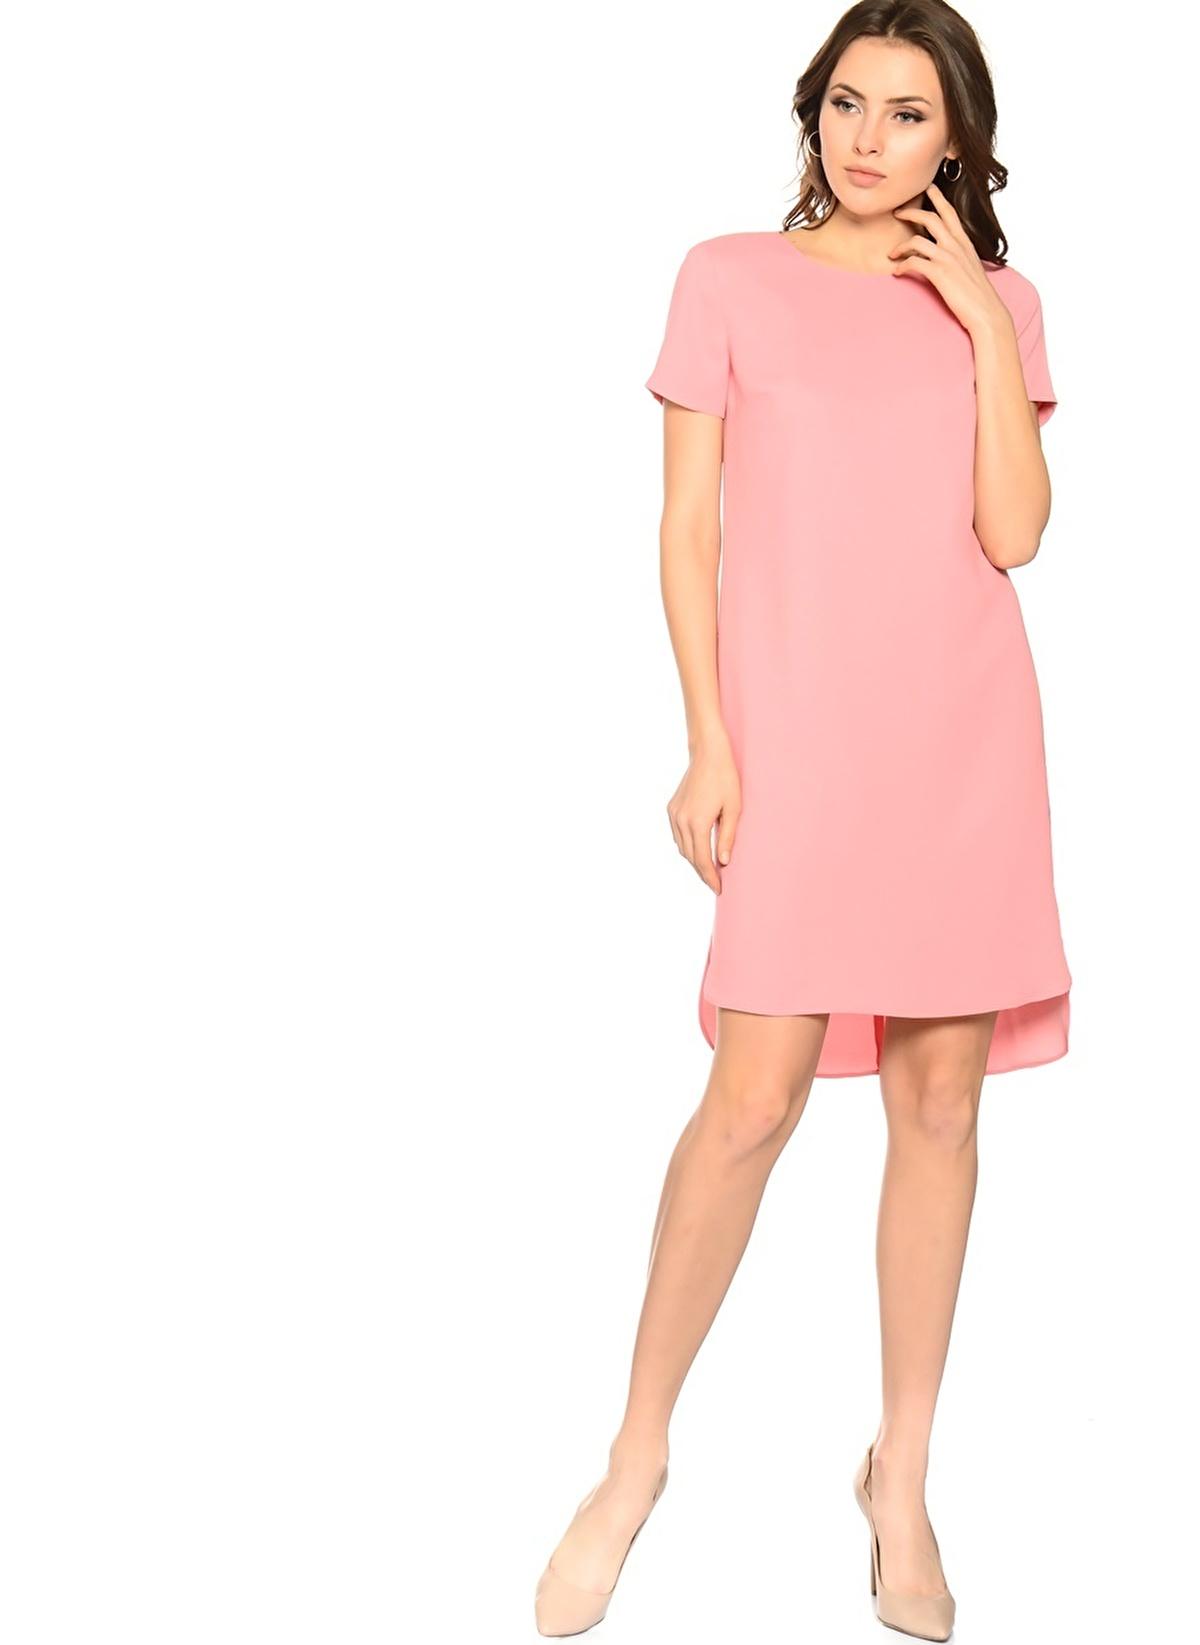 House Of Camellia Elbise 71ata Hoce014 Hc Elbise Pembe – 42.74 TL